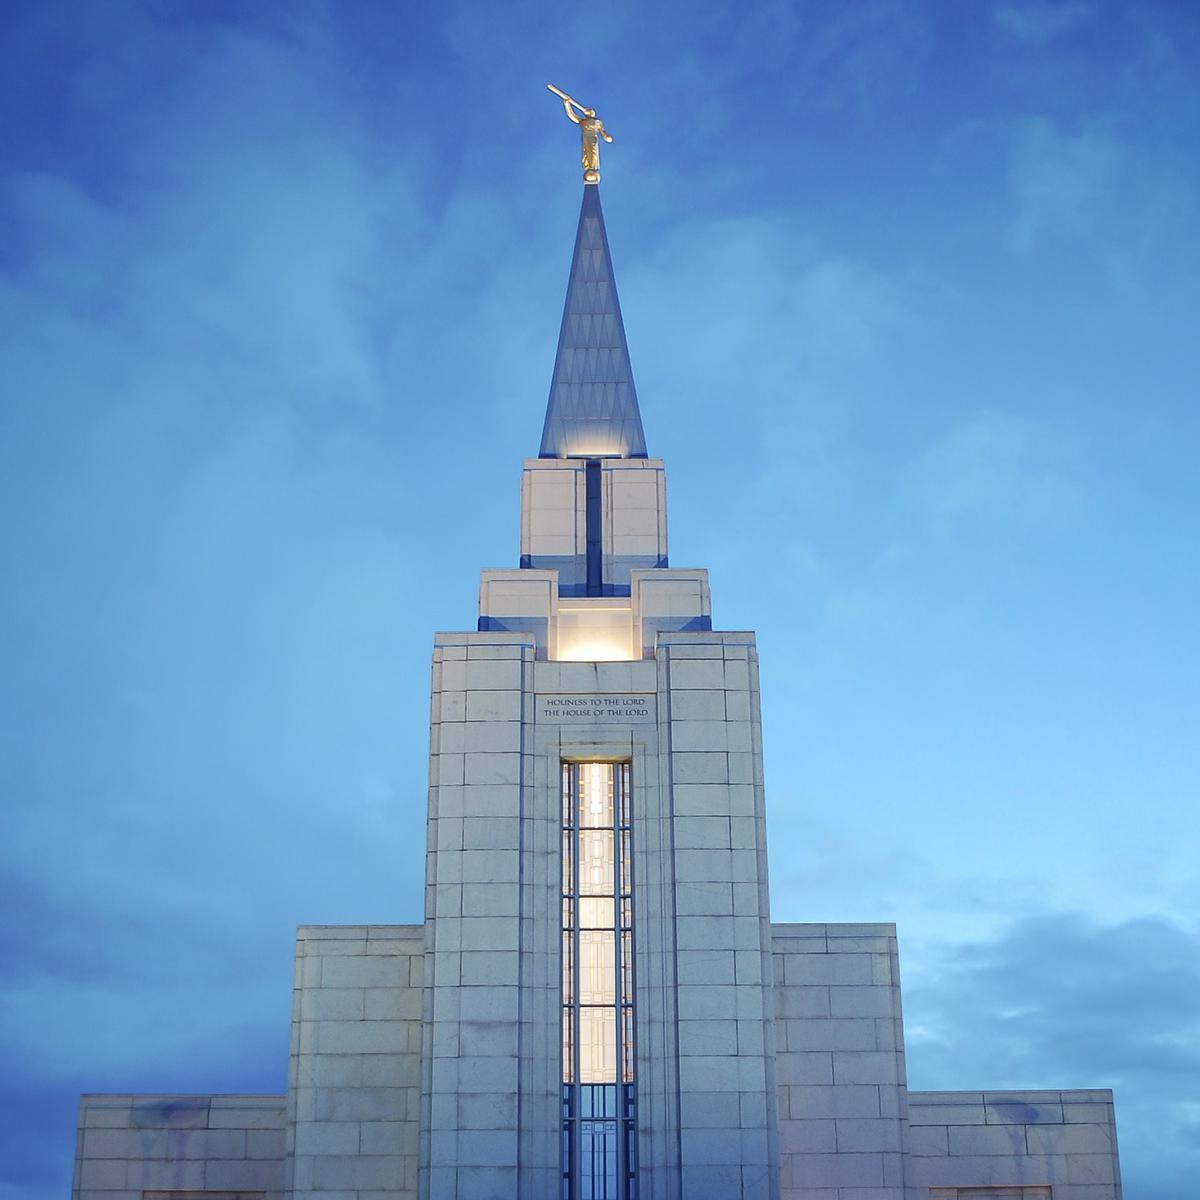 Image of the Vancouver Mormon Temple in British Columbia, Canada